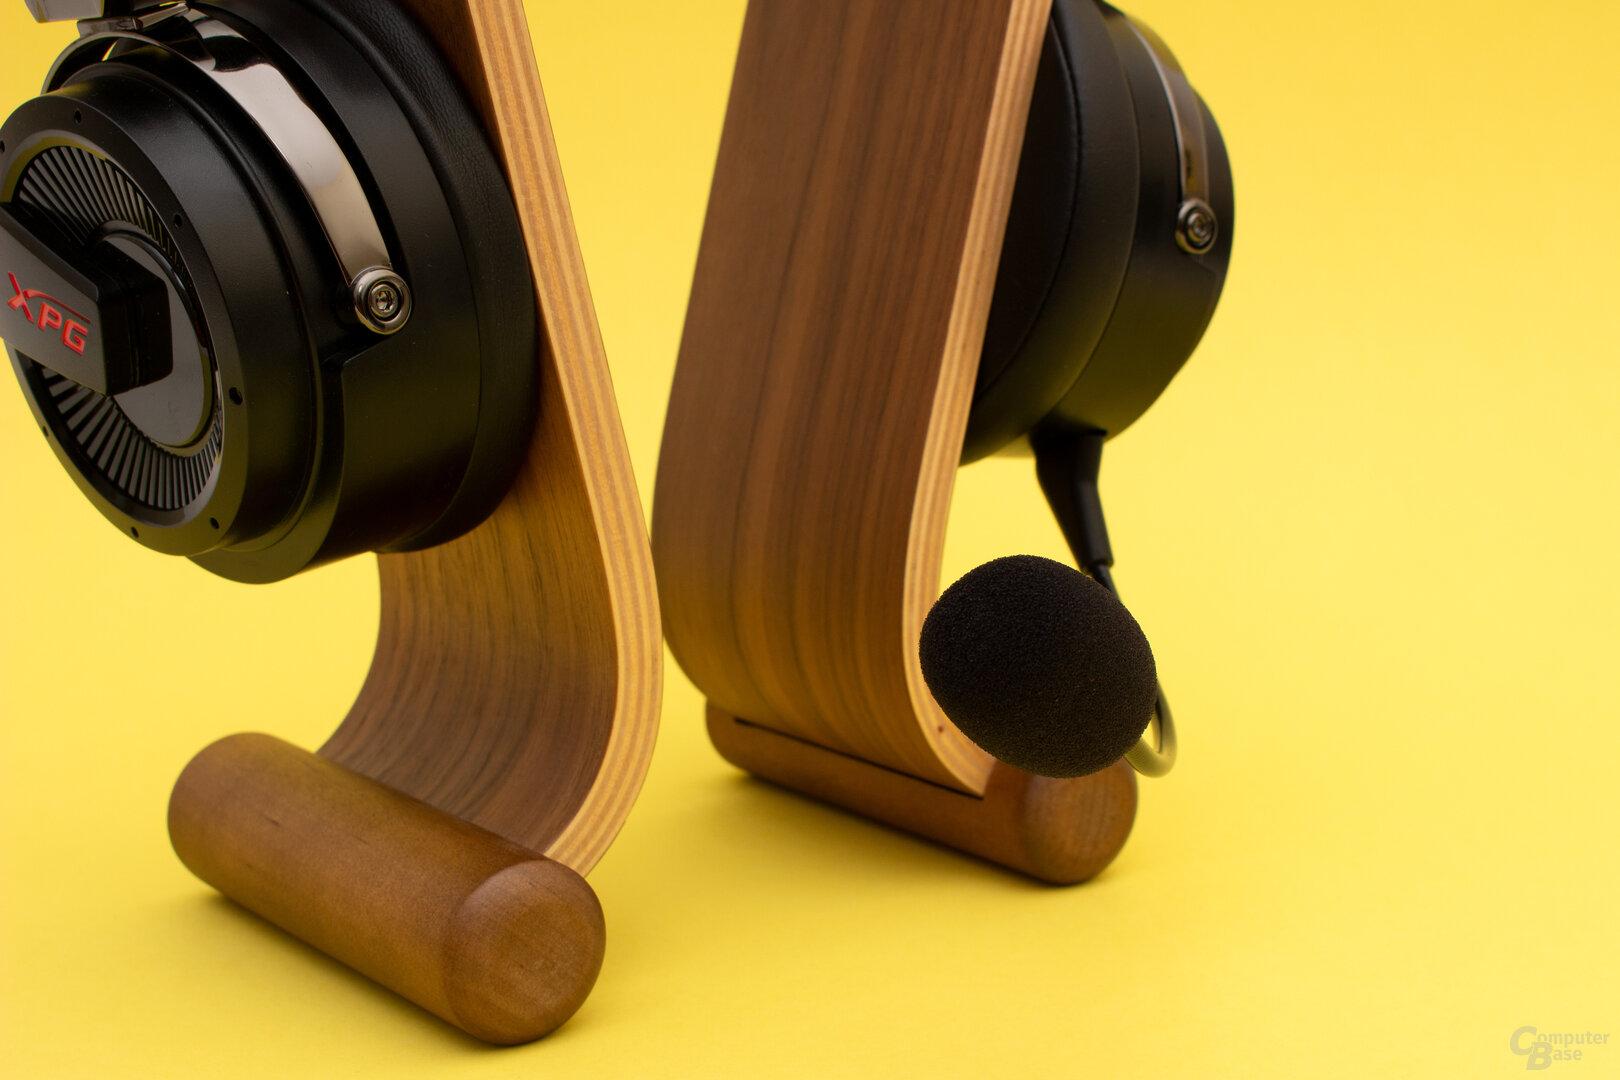 Das Mikrofon beim Precog liefert einen guten Klang, aber auch Störgeräusche